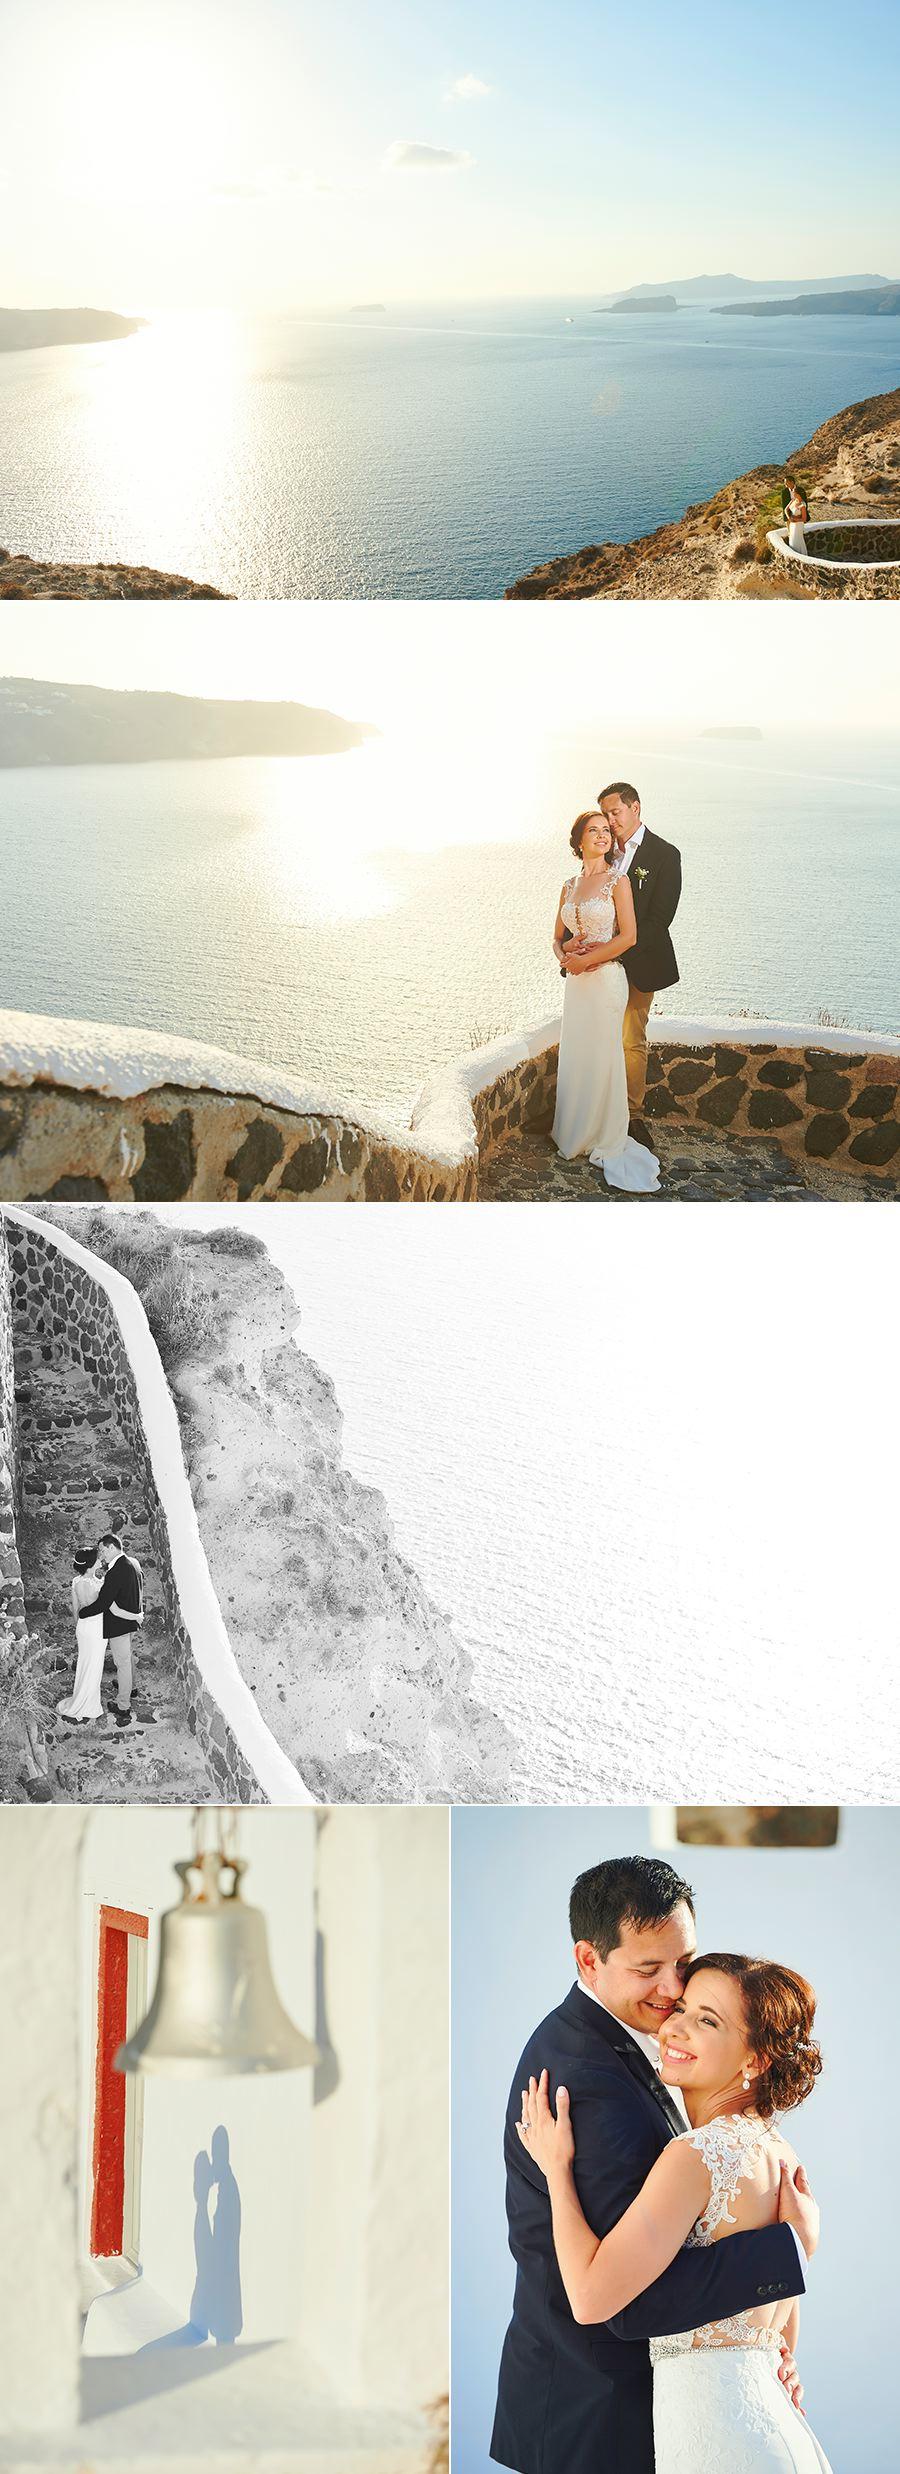 paul-simone-wedding-photos-11